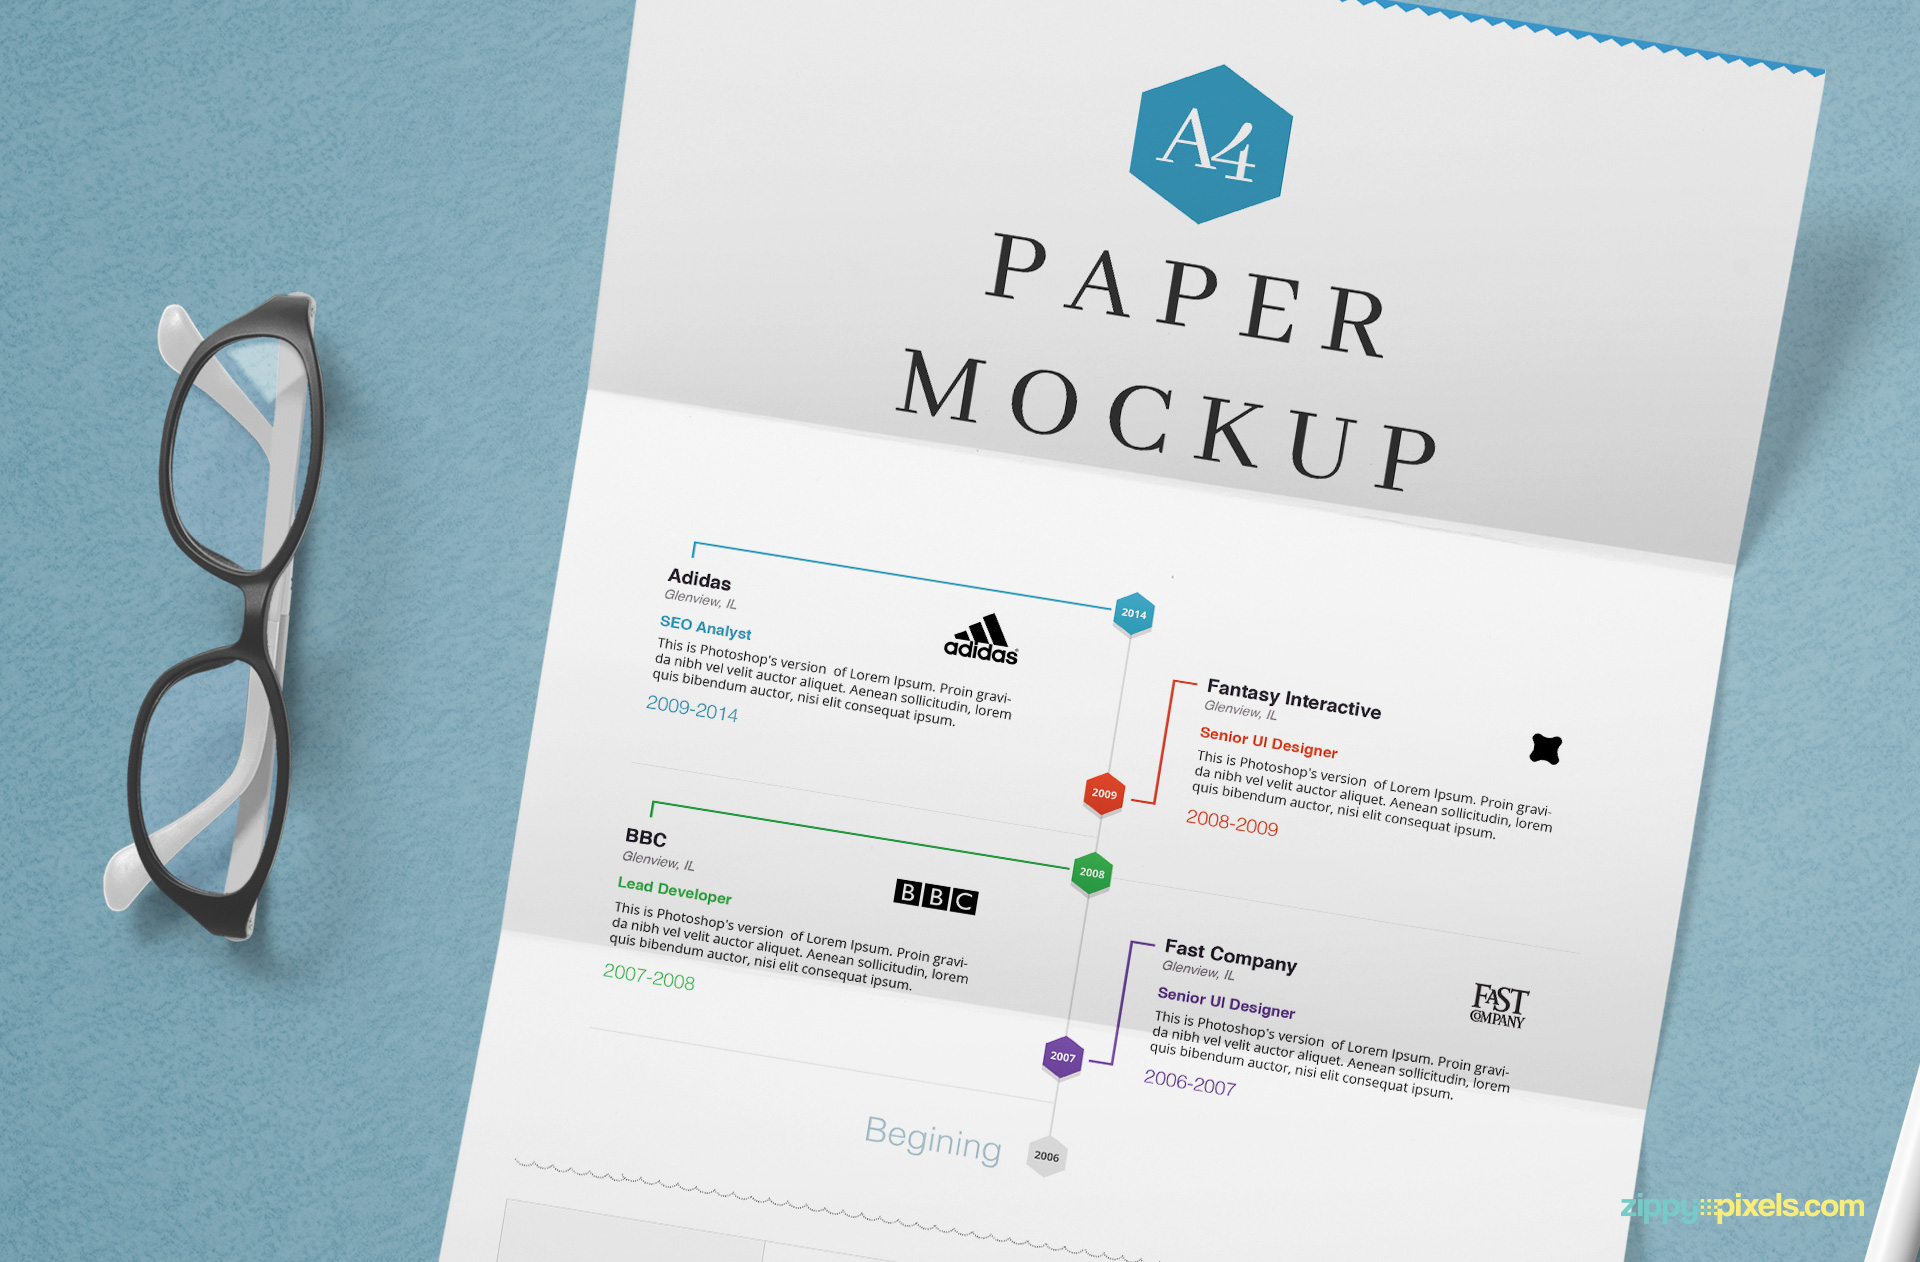 A4 size paper mockup.